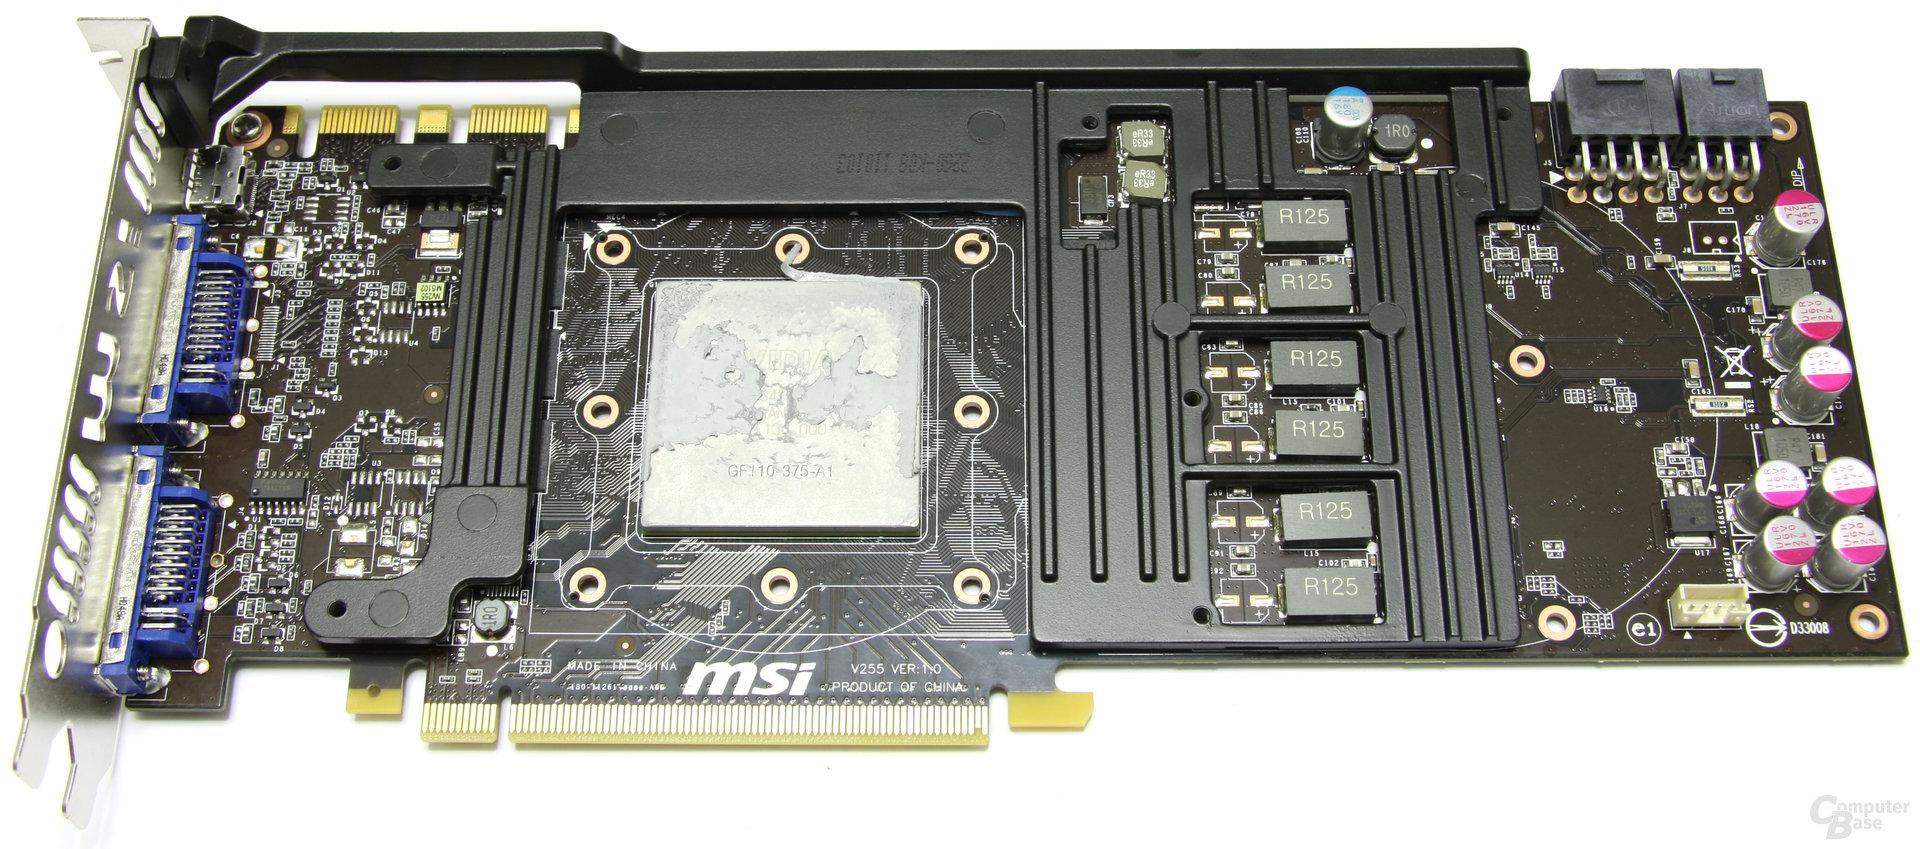 GeForce GTX 580 TFII OC Passivkühler